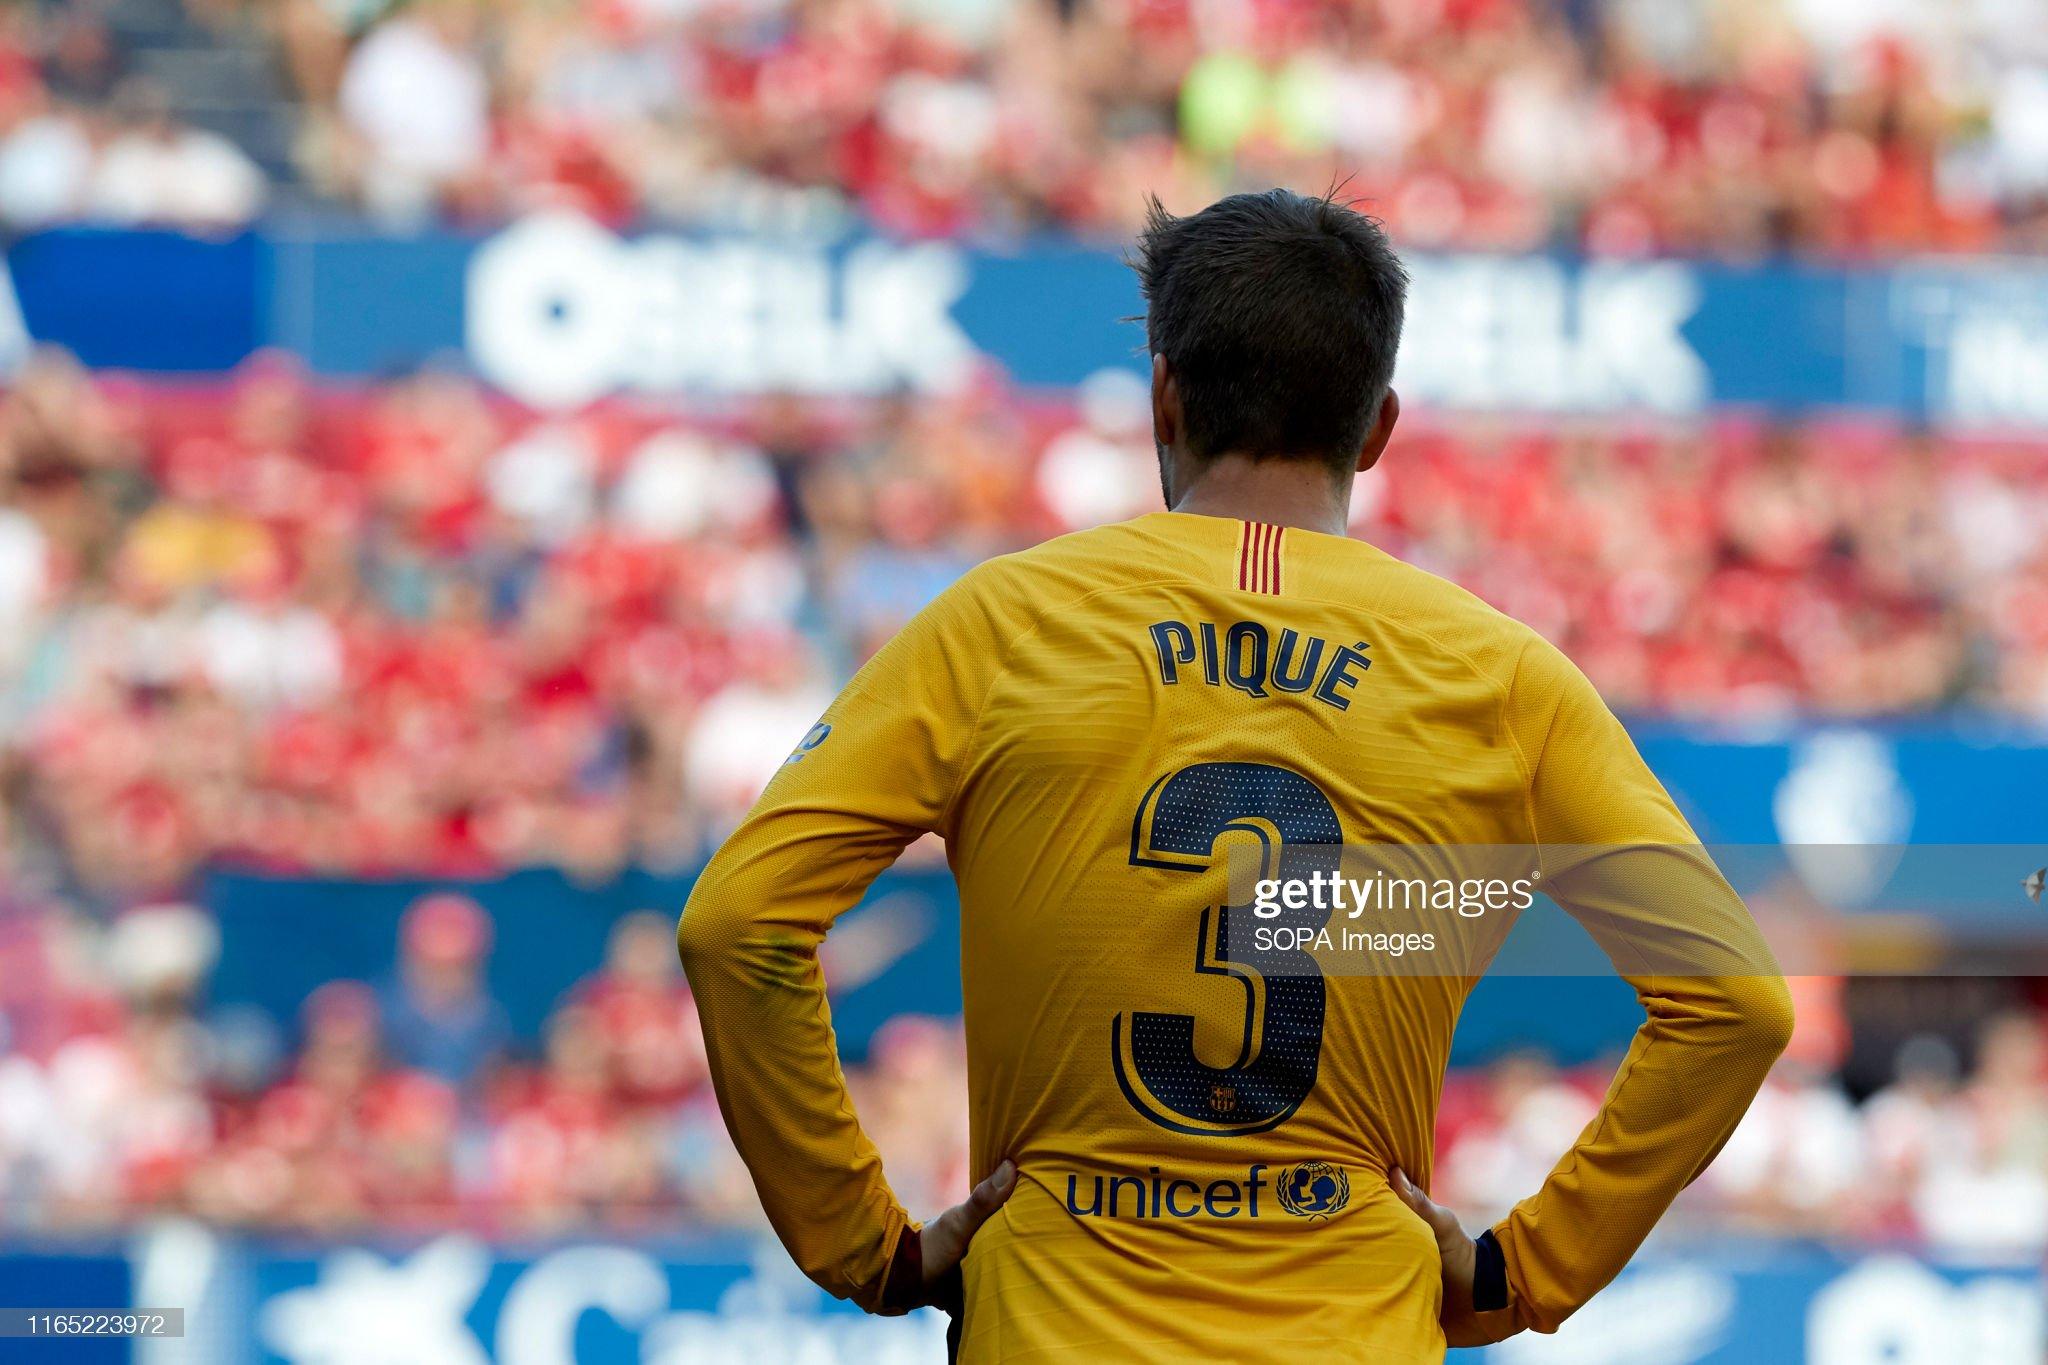 صور مباراة : أوساسونا - برشلونة 2-2 ( 31-08-2019 )  Gerard-piqu-in-action-during-the-spanish-la-liga-santander-match-ca-picture-id1165223972?s=2048x2048